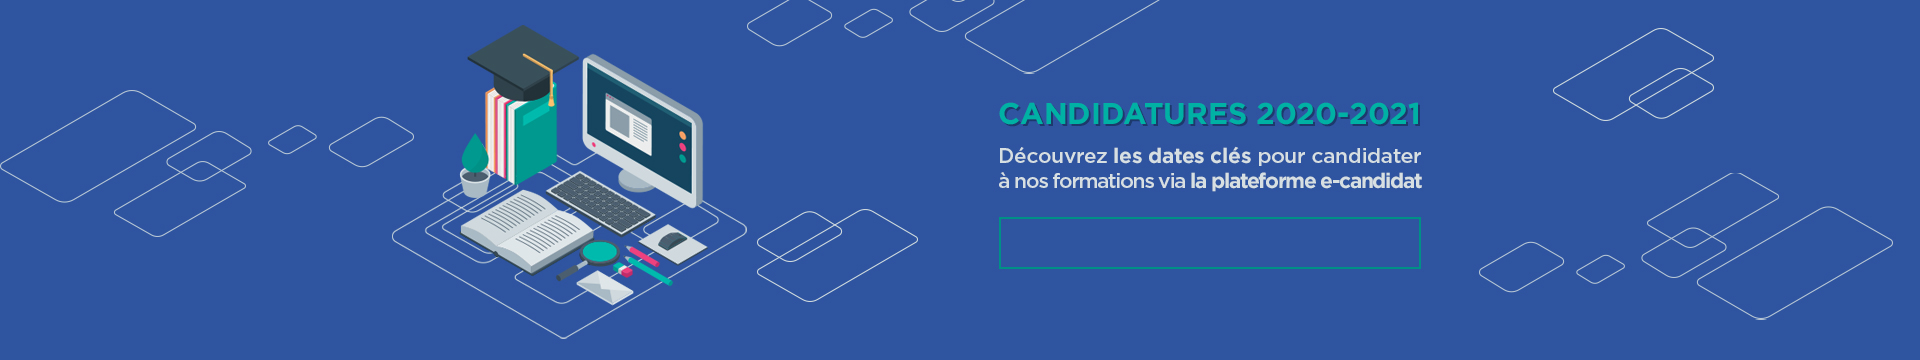 Candidatures e-candidat 2020-2021 - Montpellier Management